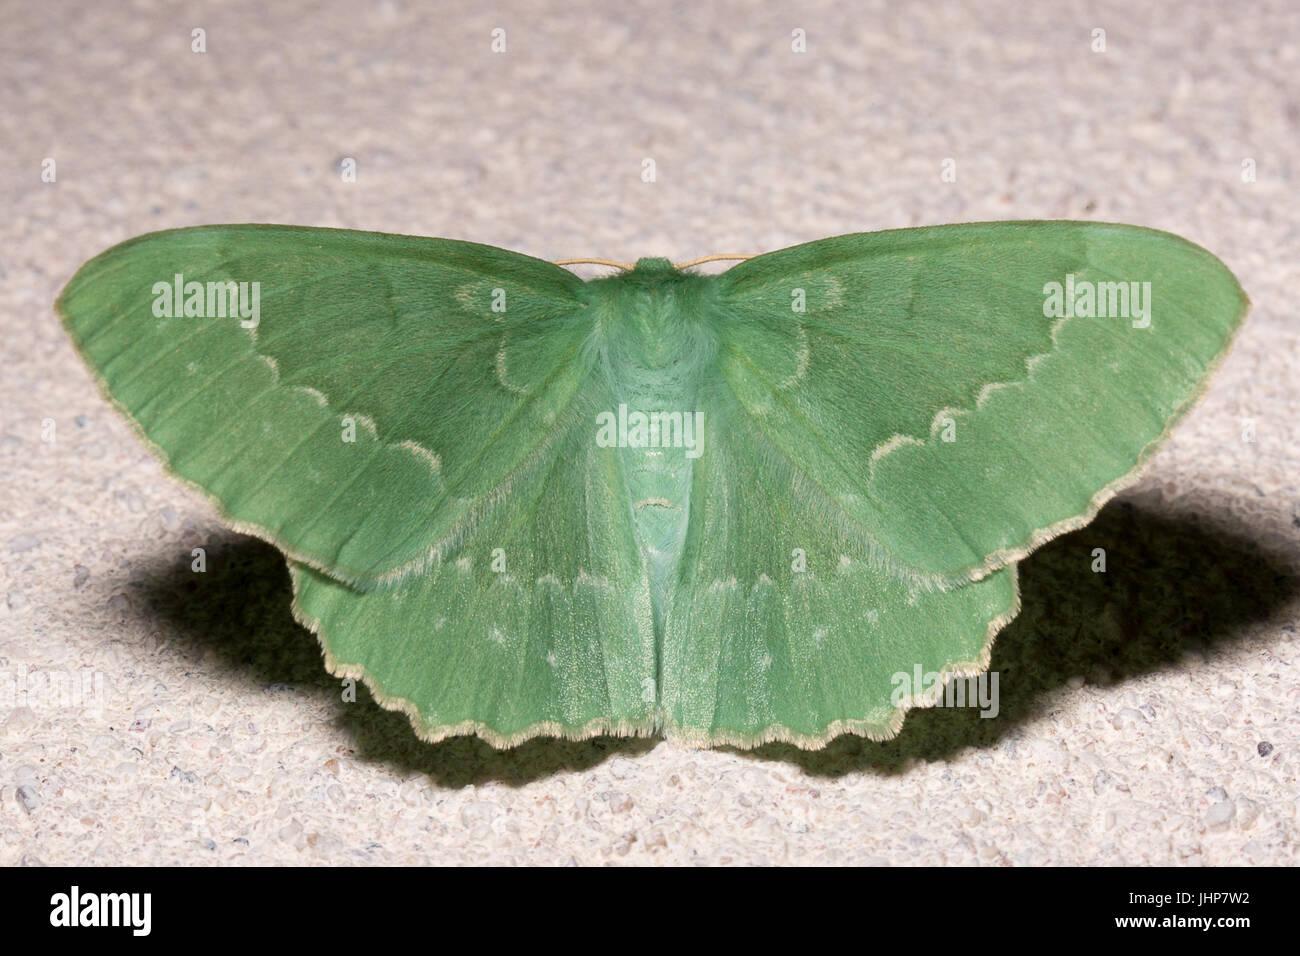 Large Emerald Moth Extremely Close Up. - Stock Image